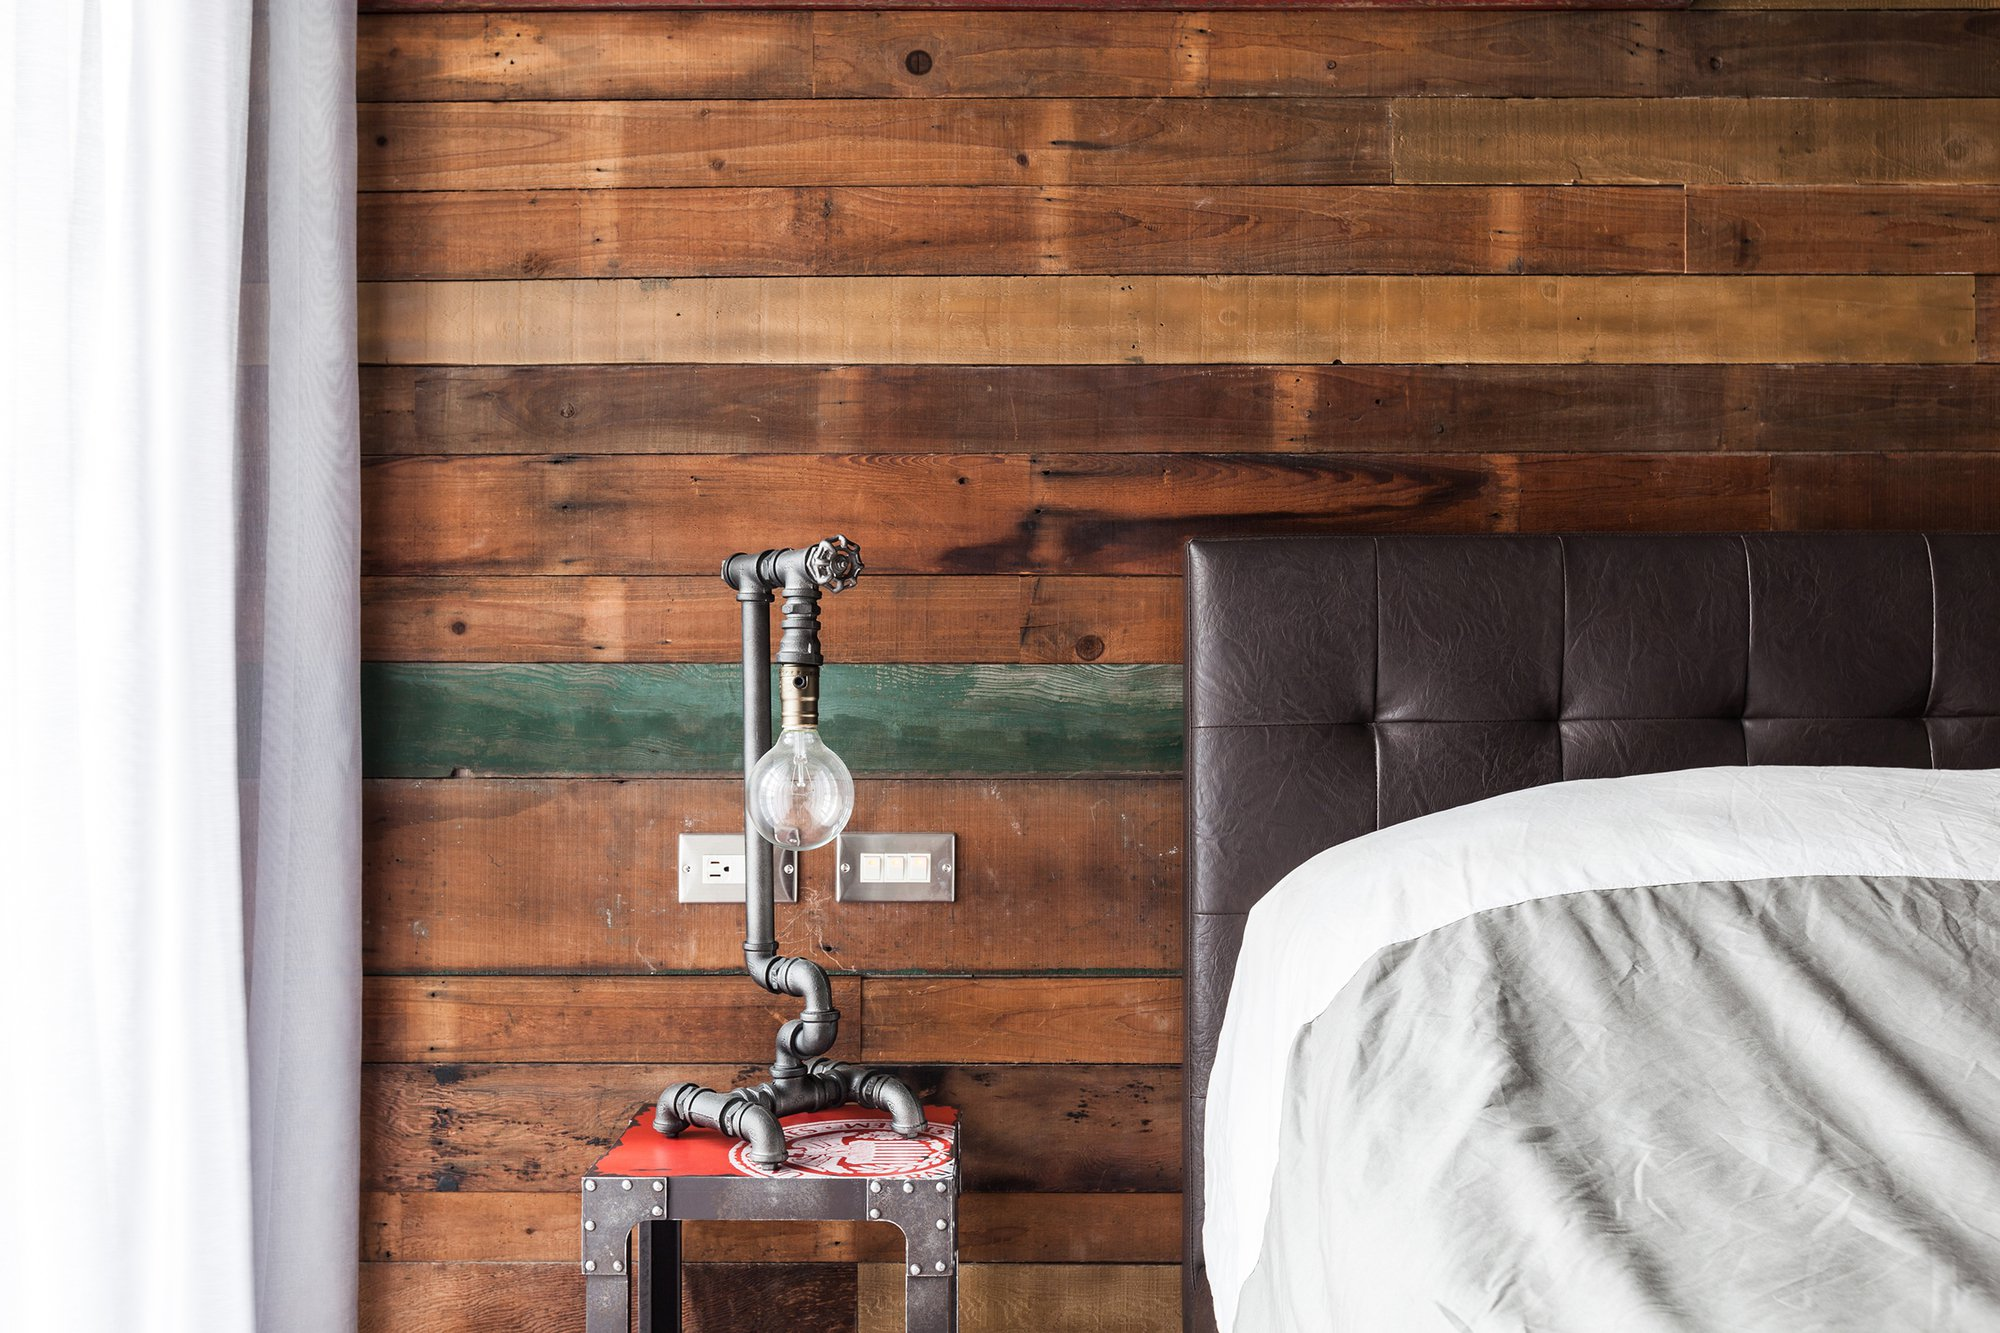 Apartment Refurbishment / CHI-TORCH Interior Design (5)